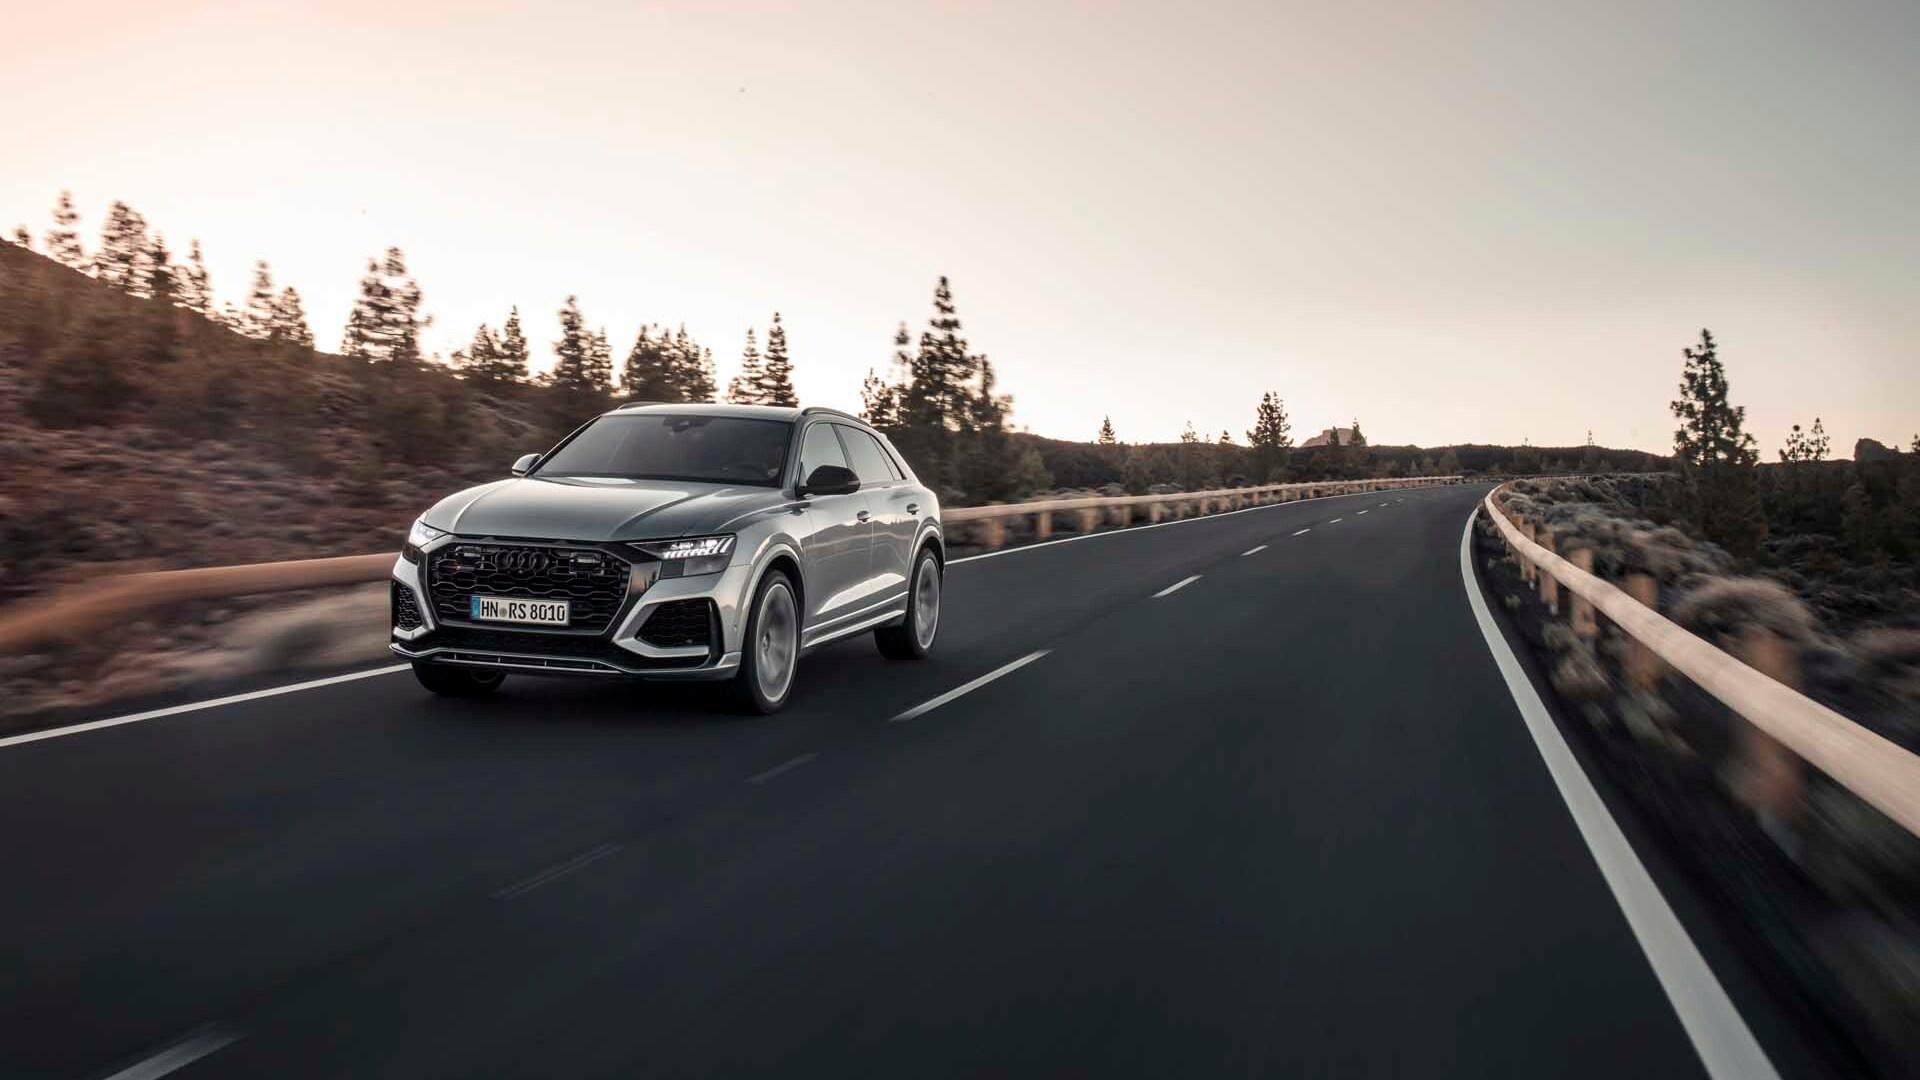 2020 Audi RS Q8 first drive